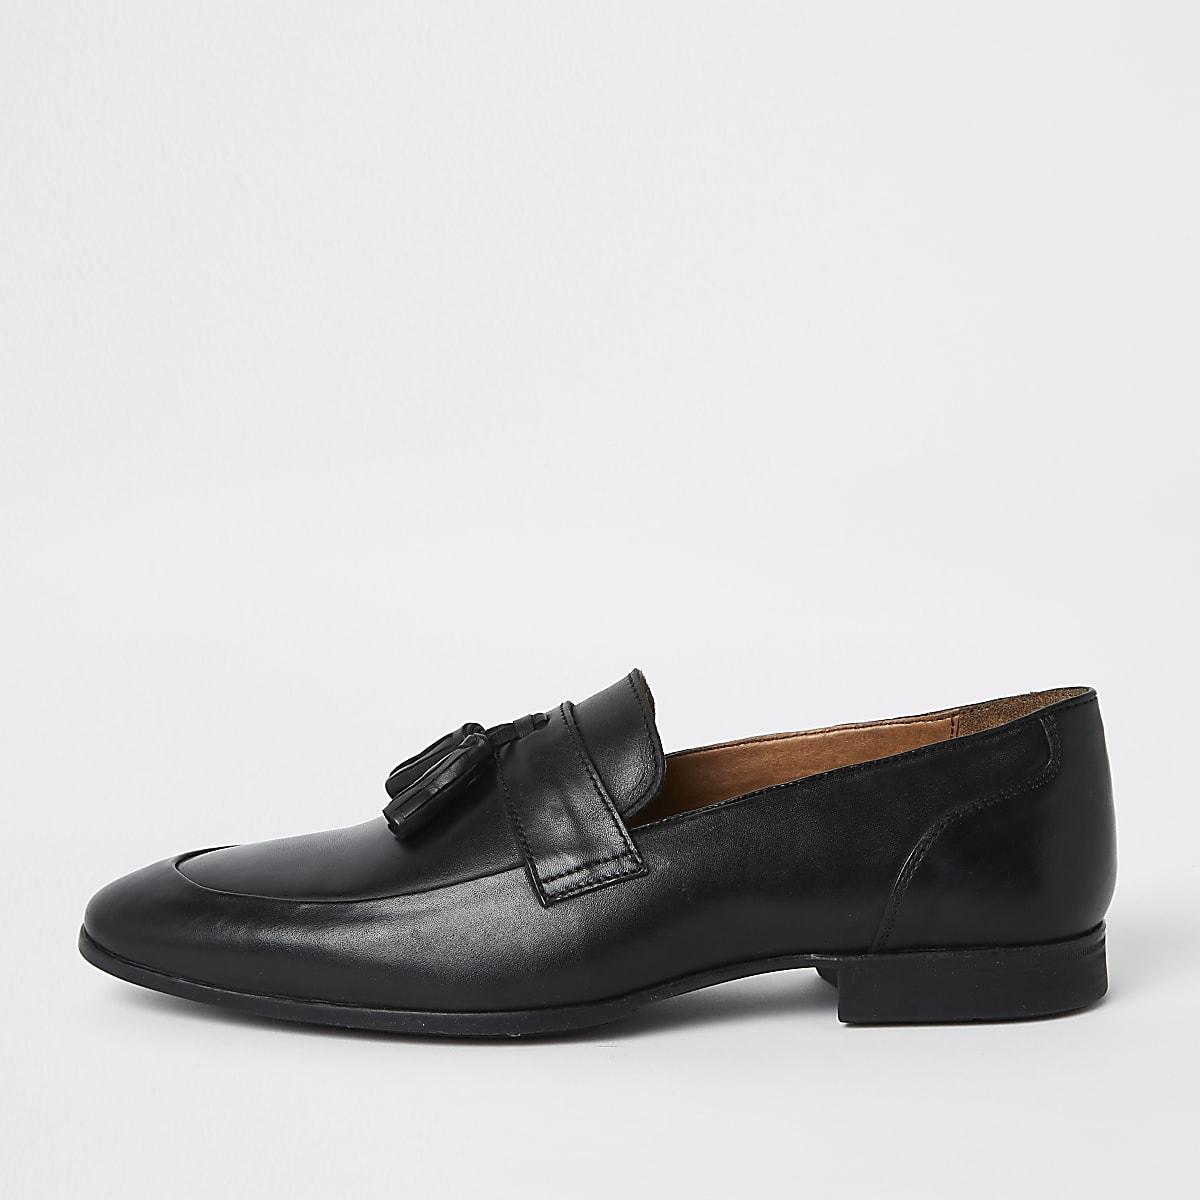 Black leather tassel smart loafers